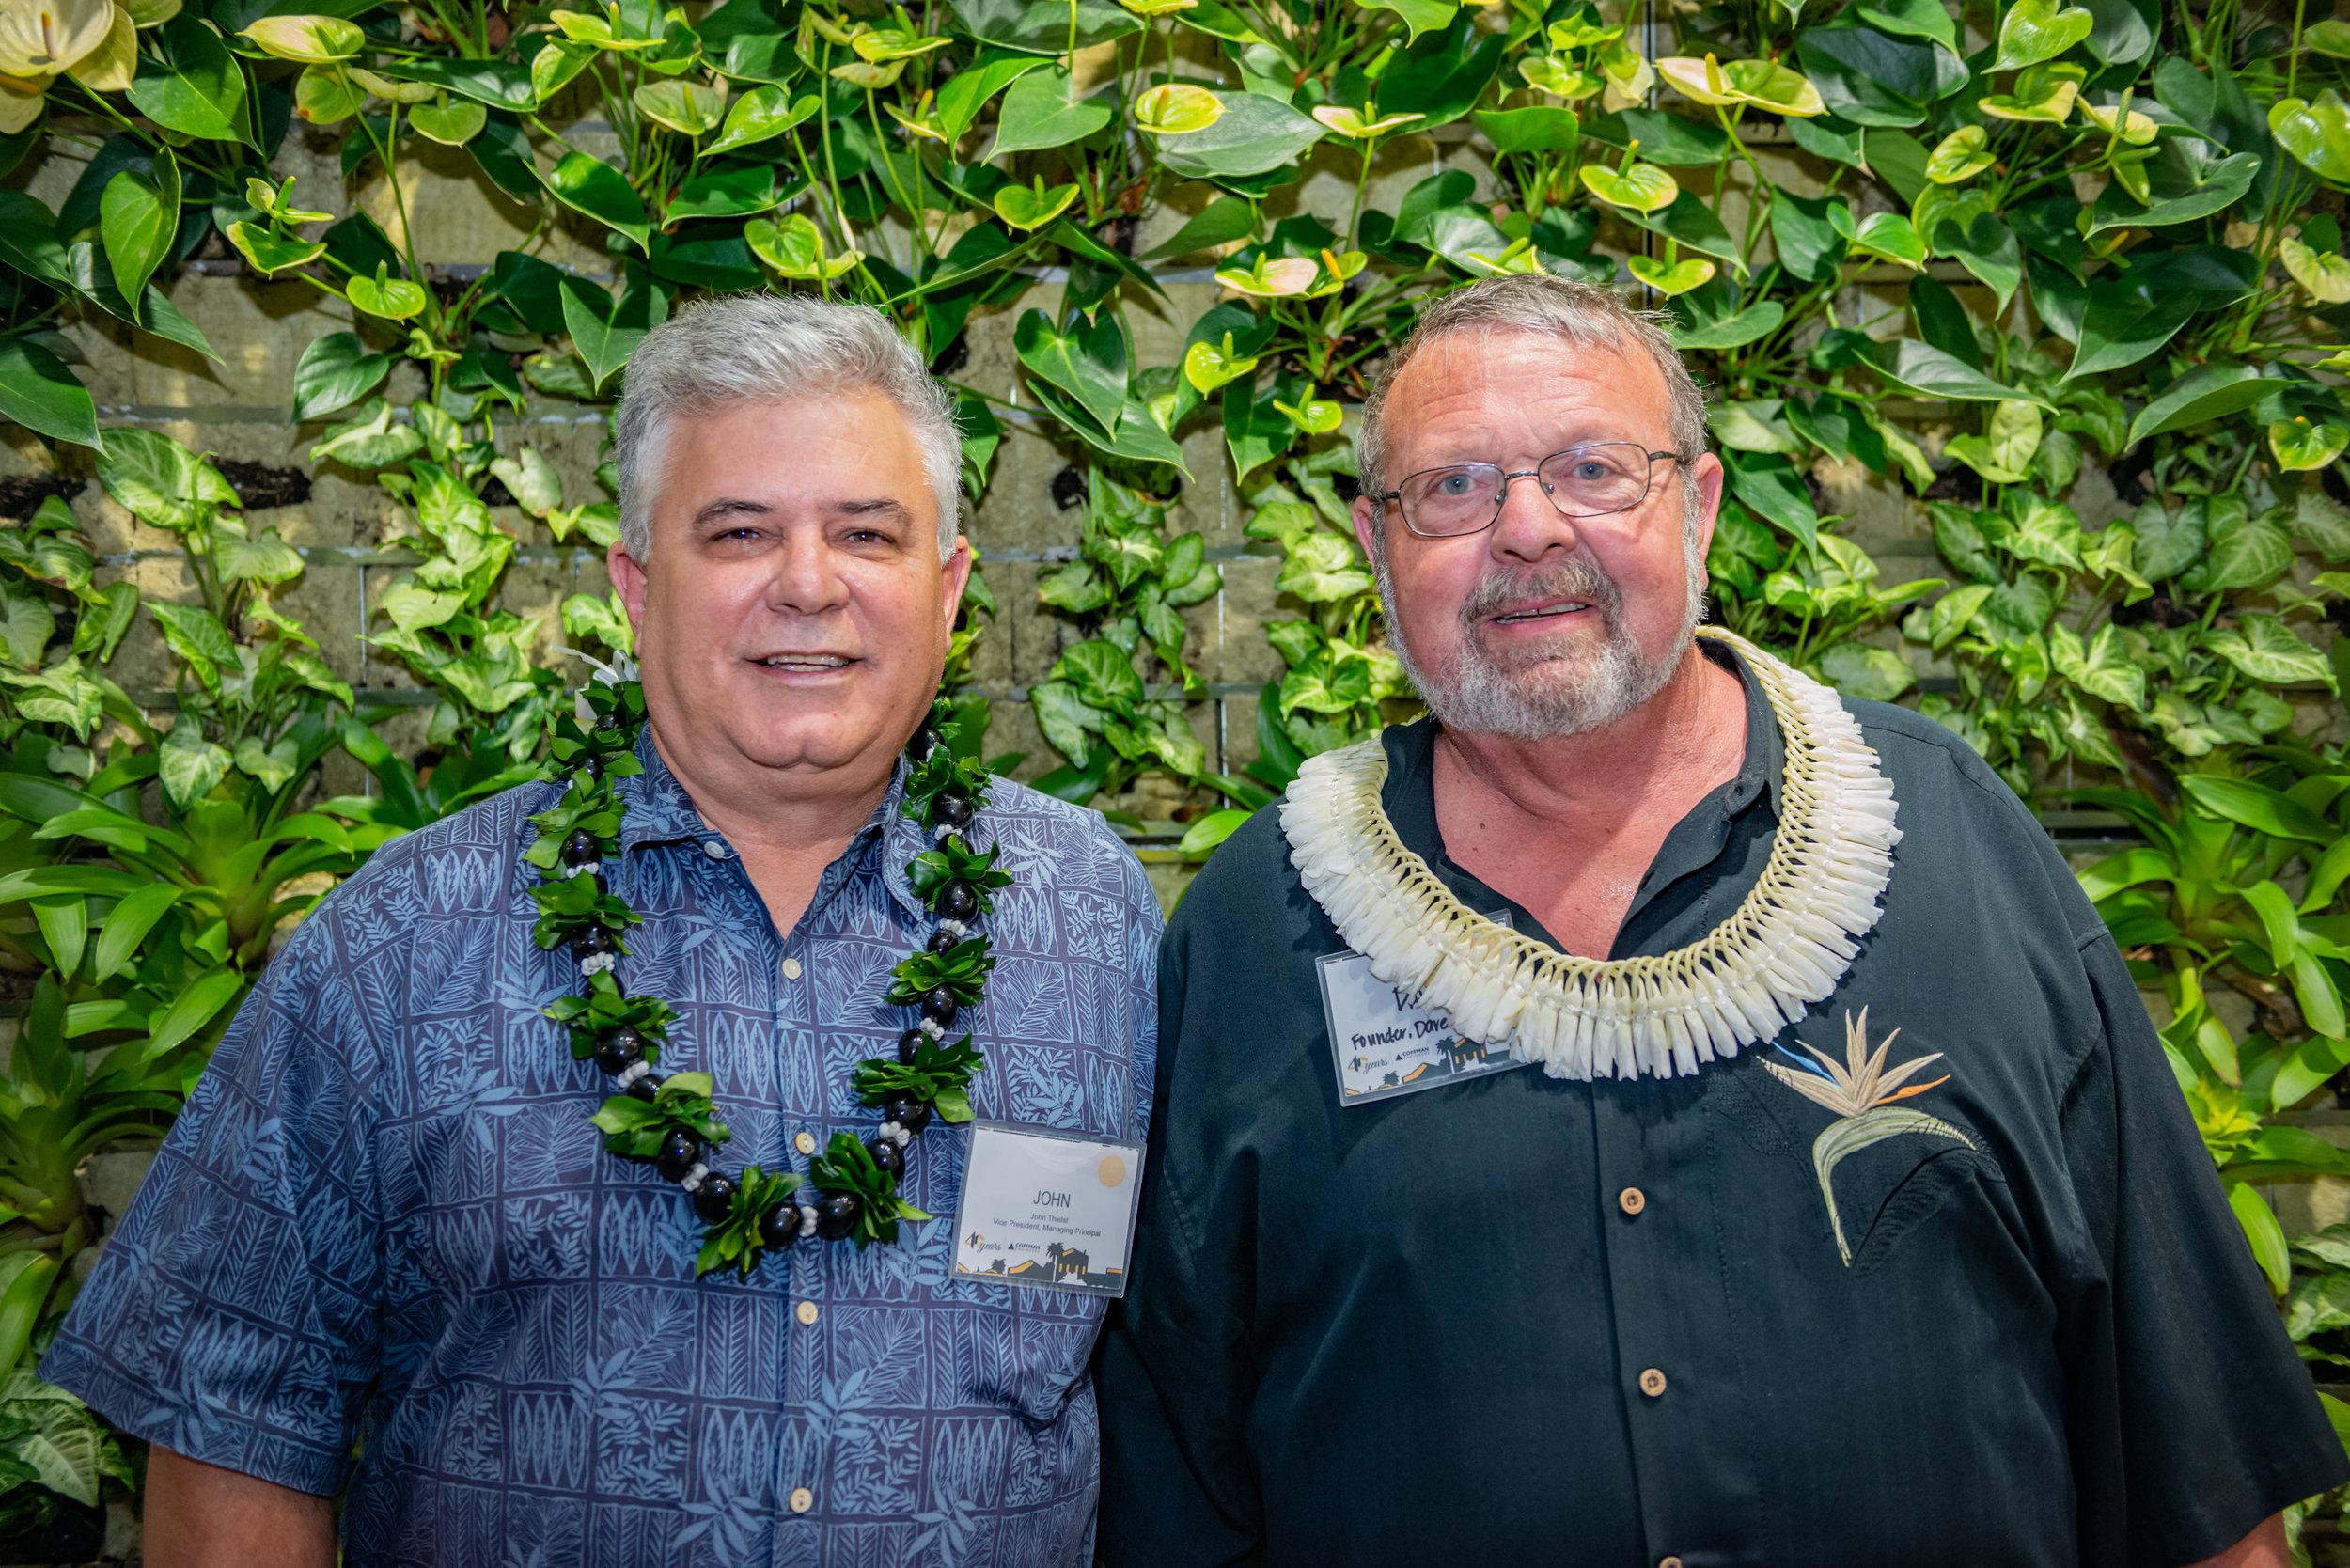 John Thielst, Honolulu Managing Principal + Dave Coffman, Founder